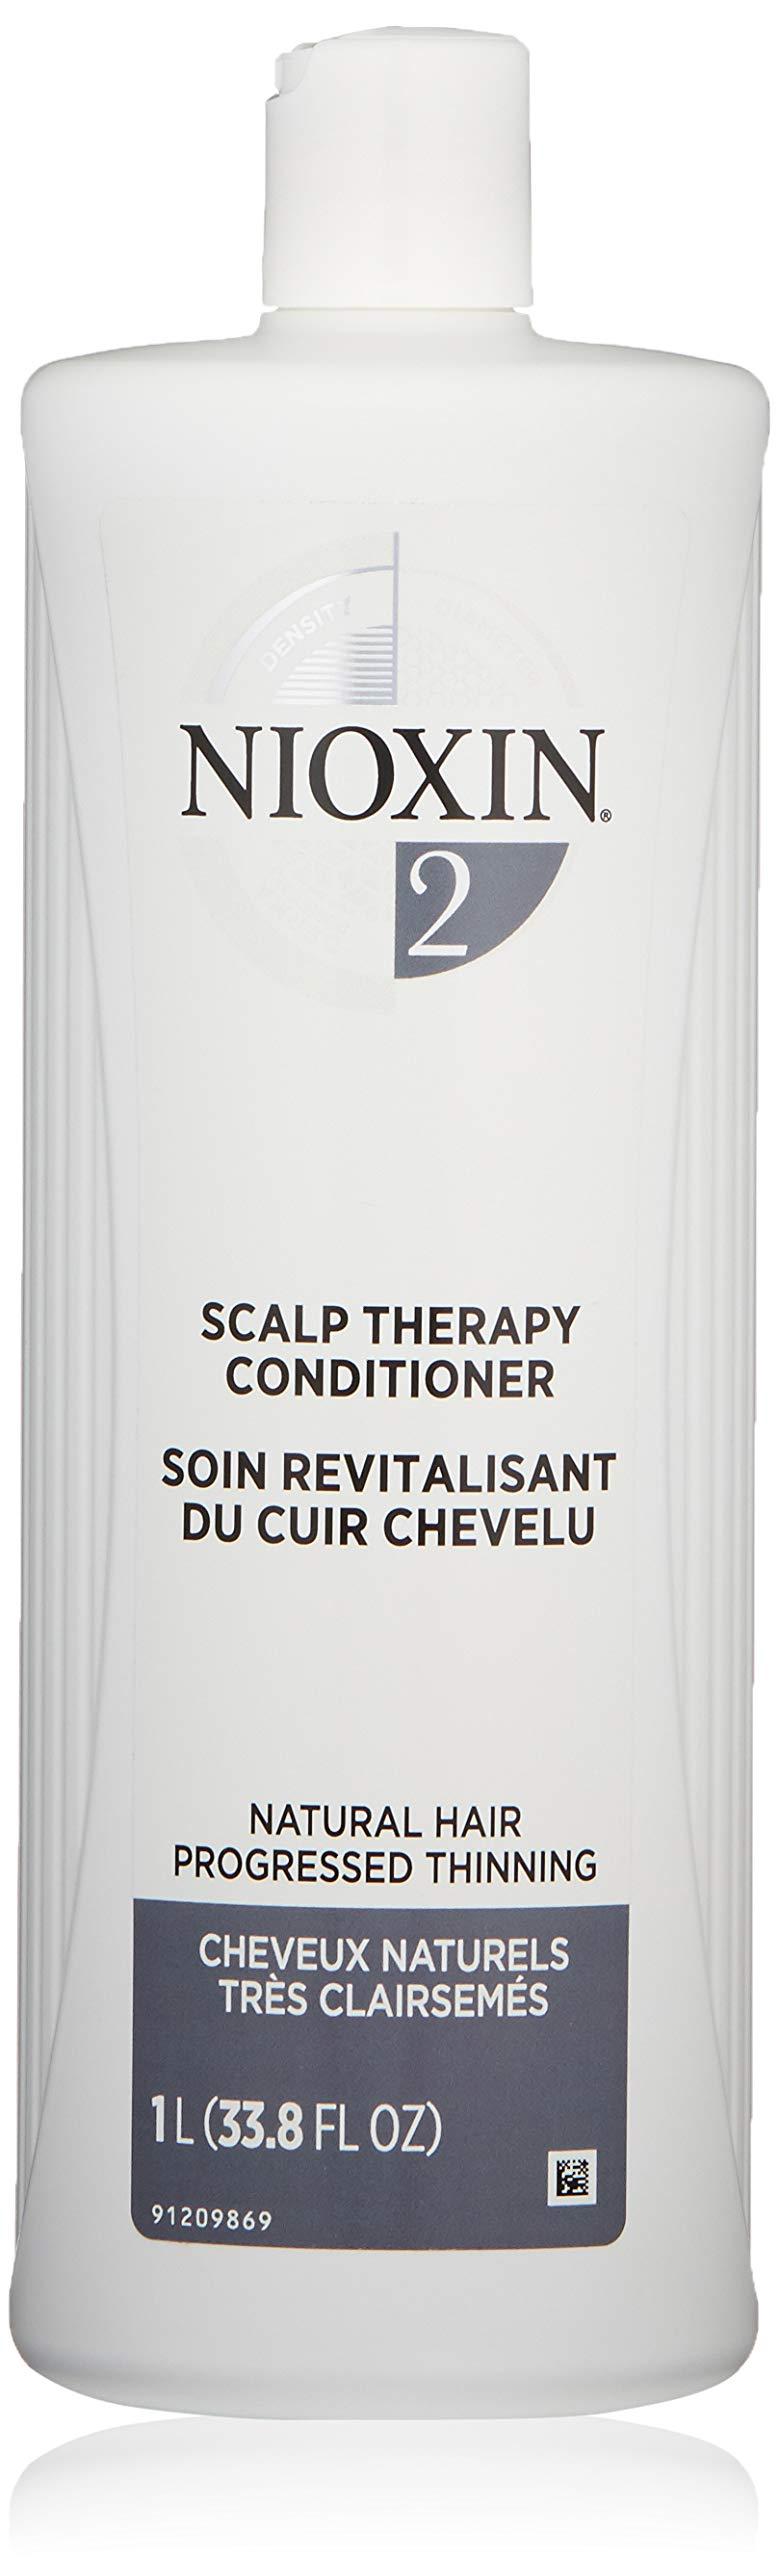 Nioxin System 2 Scalp Therapy Conditioner, 33.8 Oz.